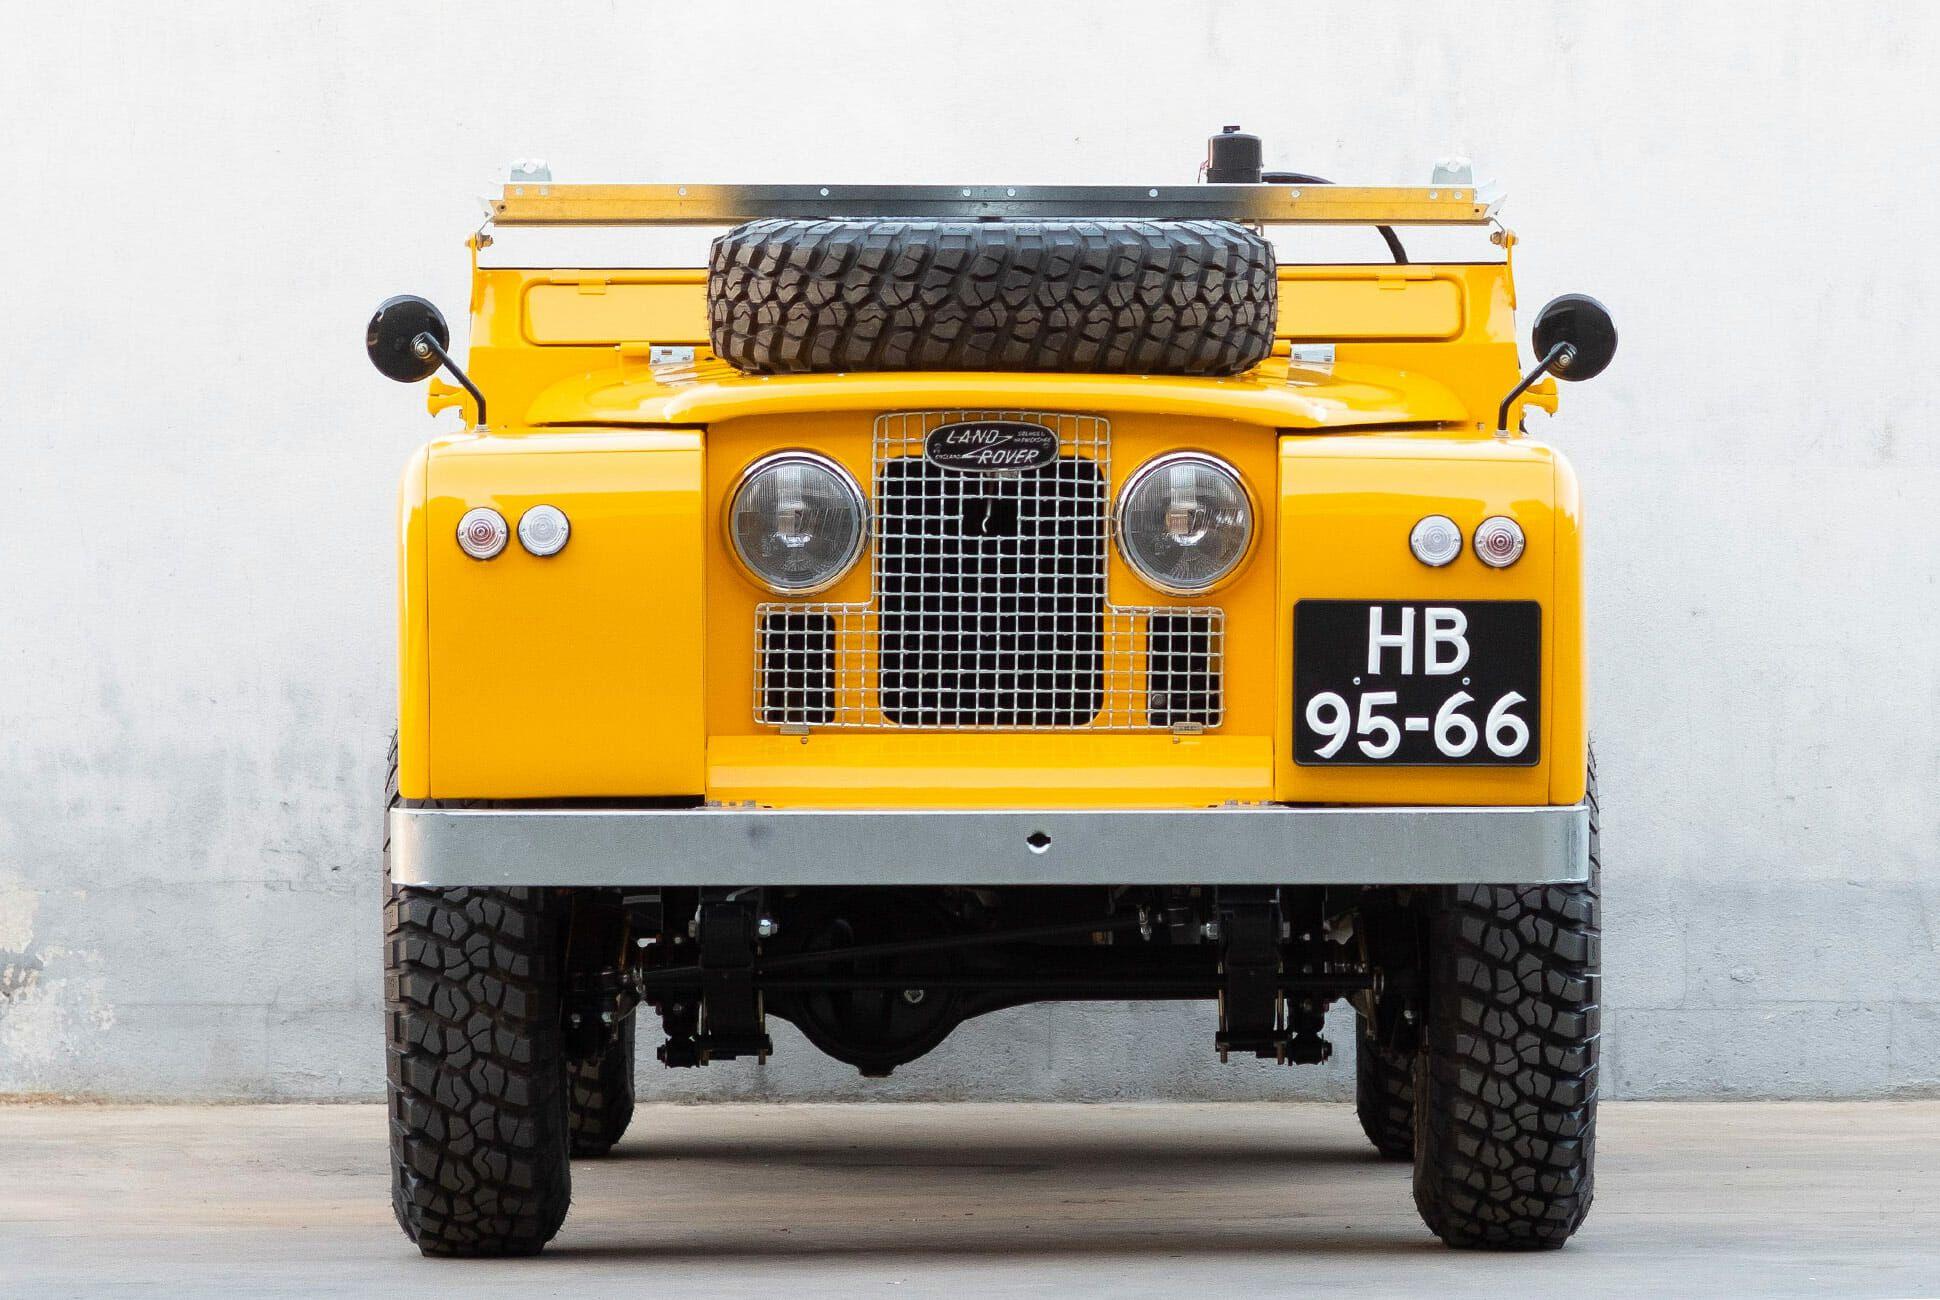 Cool-n-Vintage-x-Deus-Ex-Machina-Land-Rover-Yellow-Landmarine-gear-patrol-slide-1